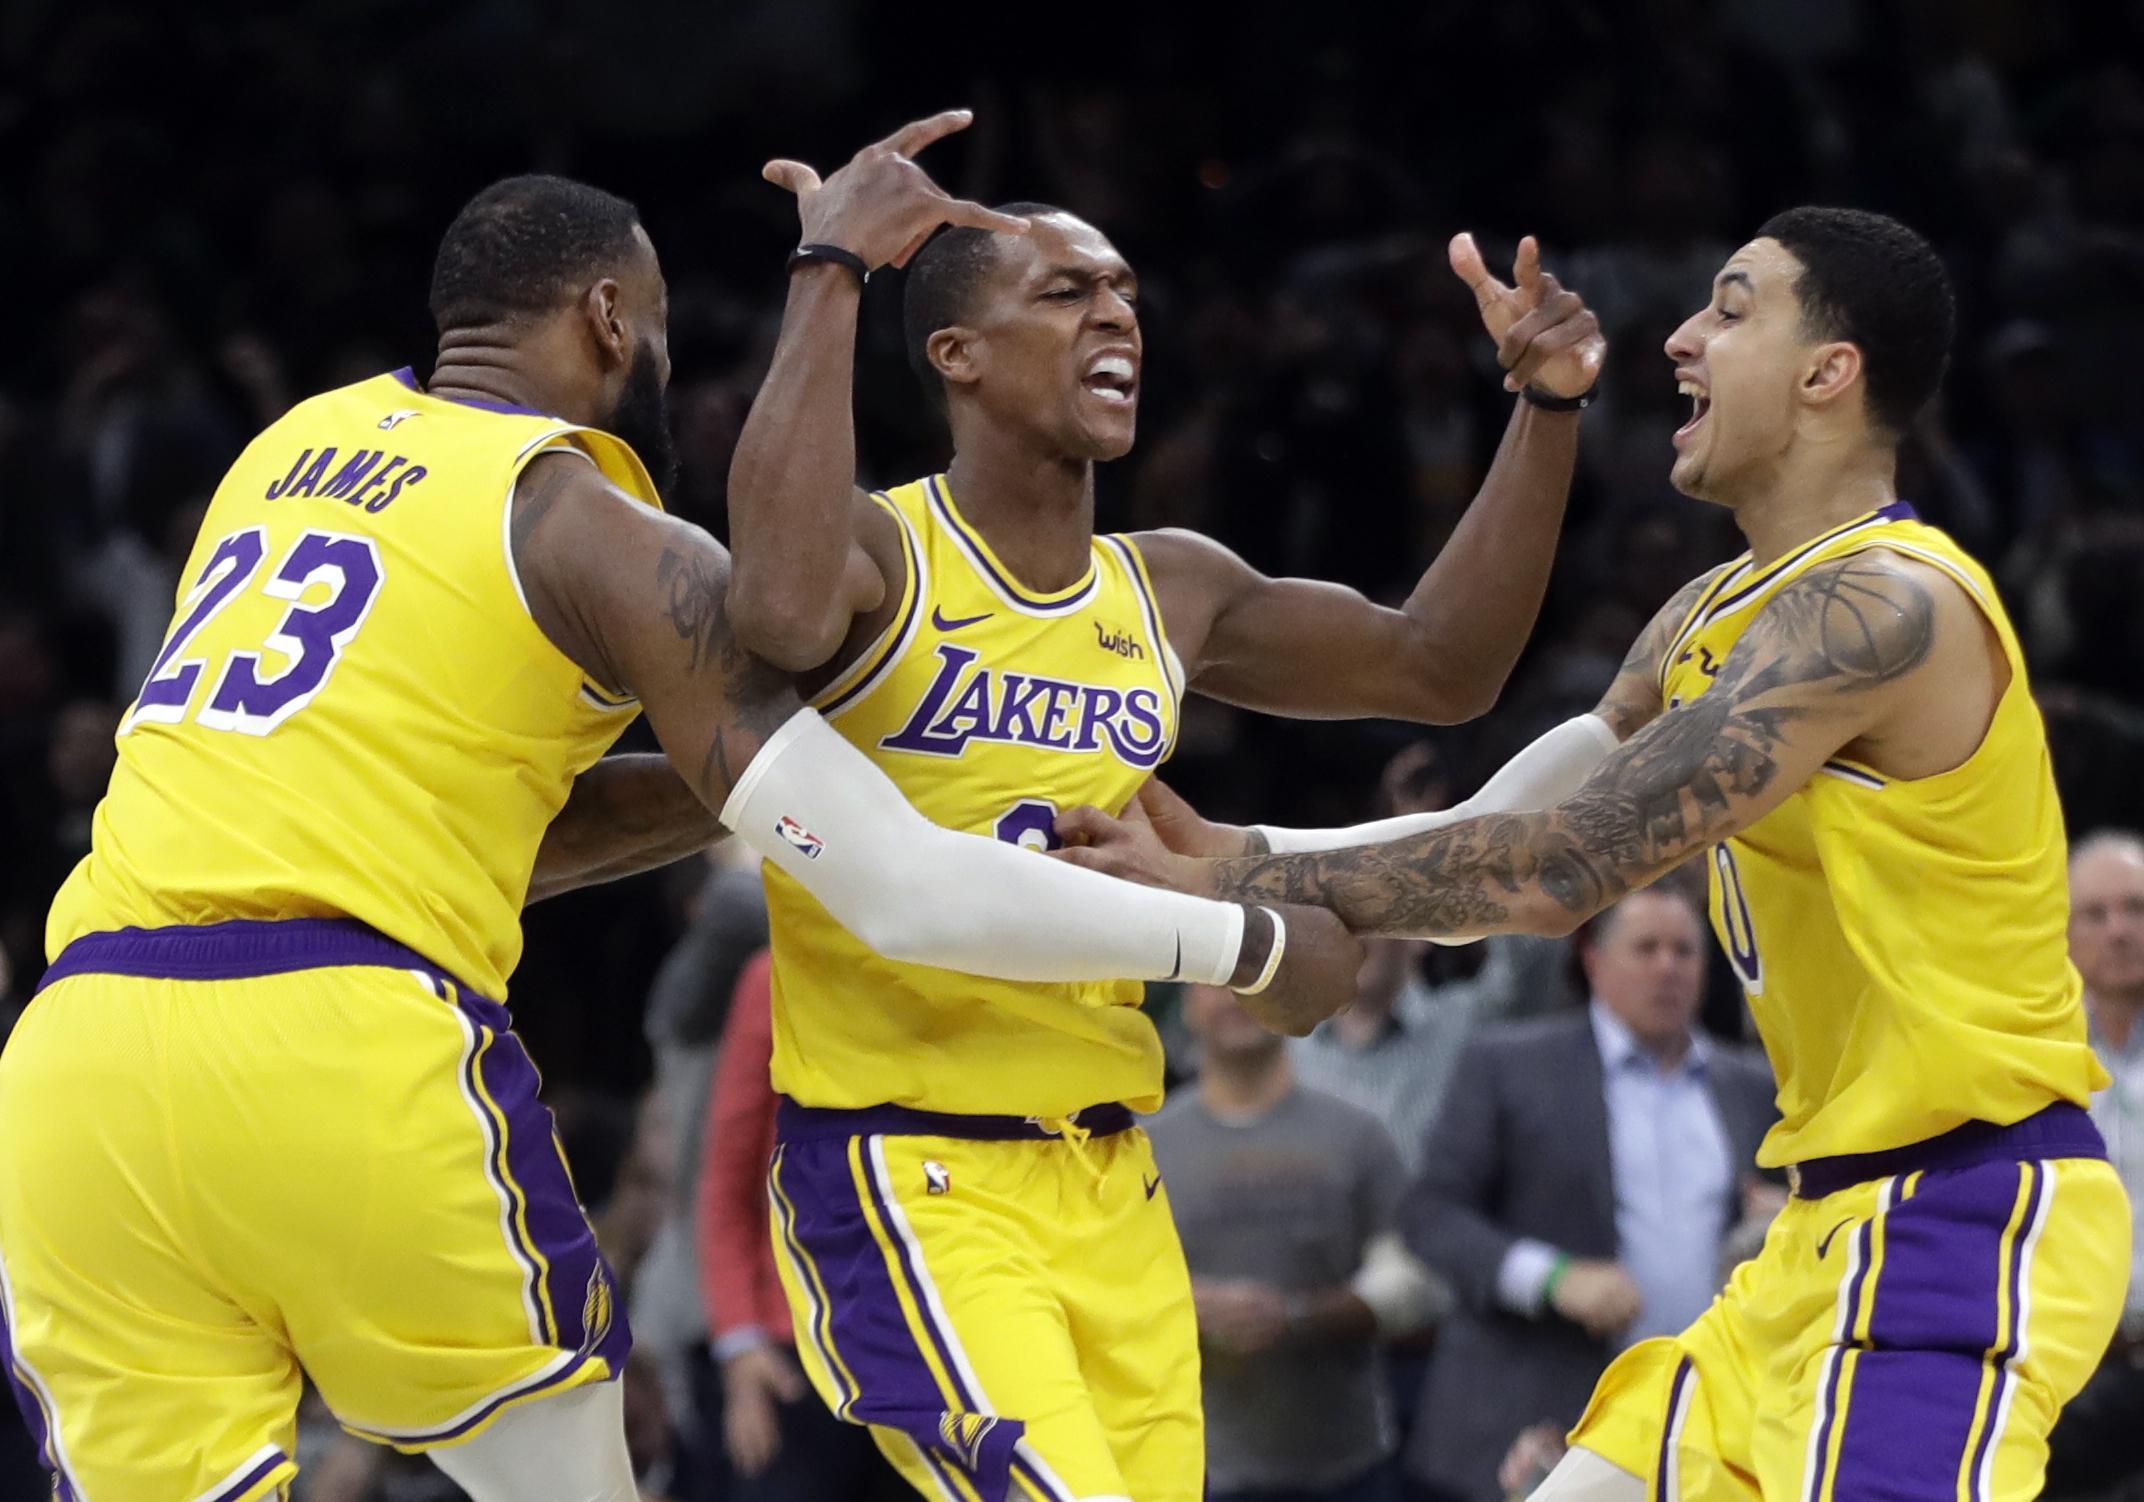 0beacea0 Lakers edge Celtics 129-128 on Rondo's jumper at the buzzer - Washington  Times